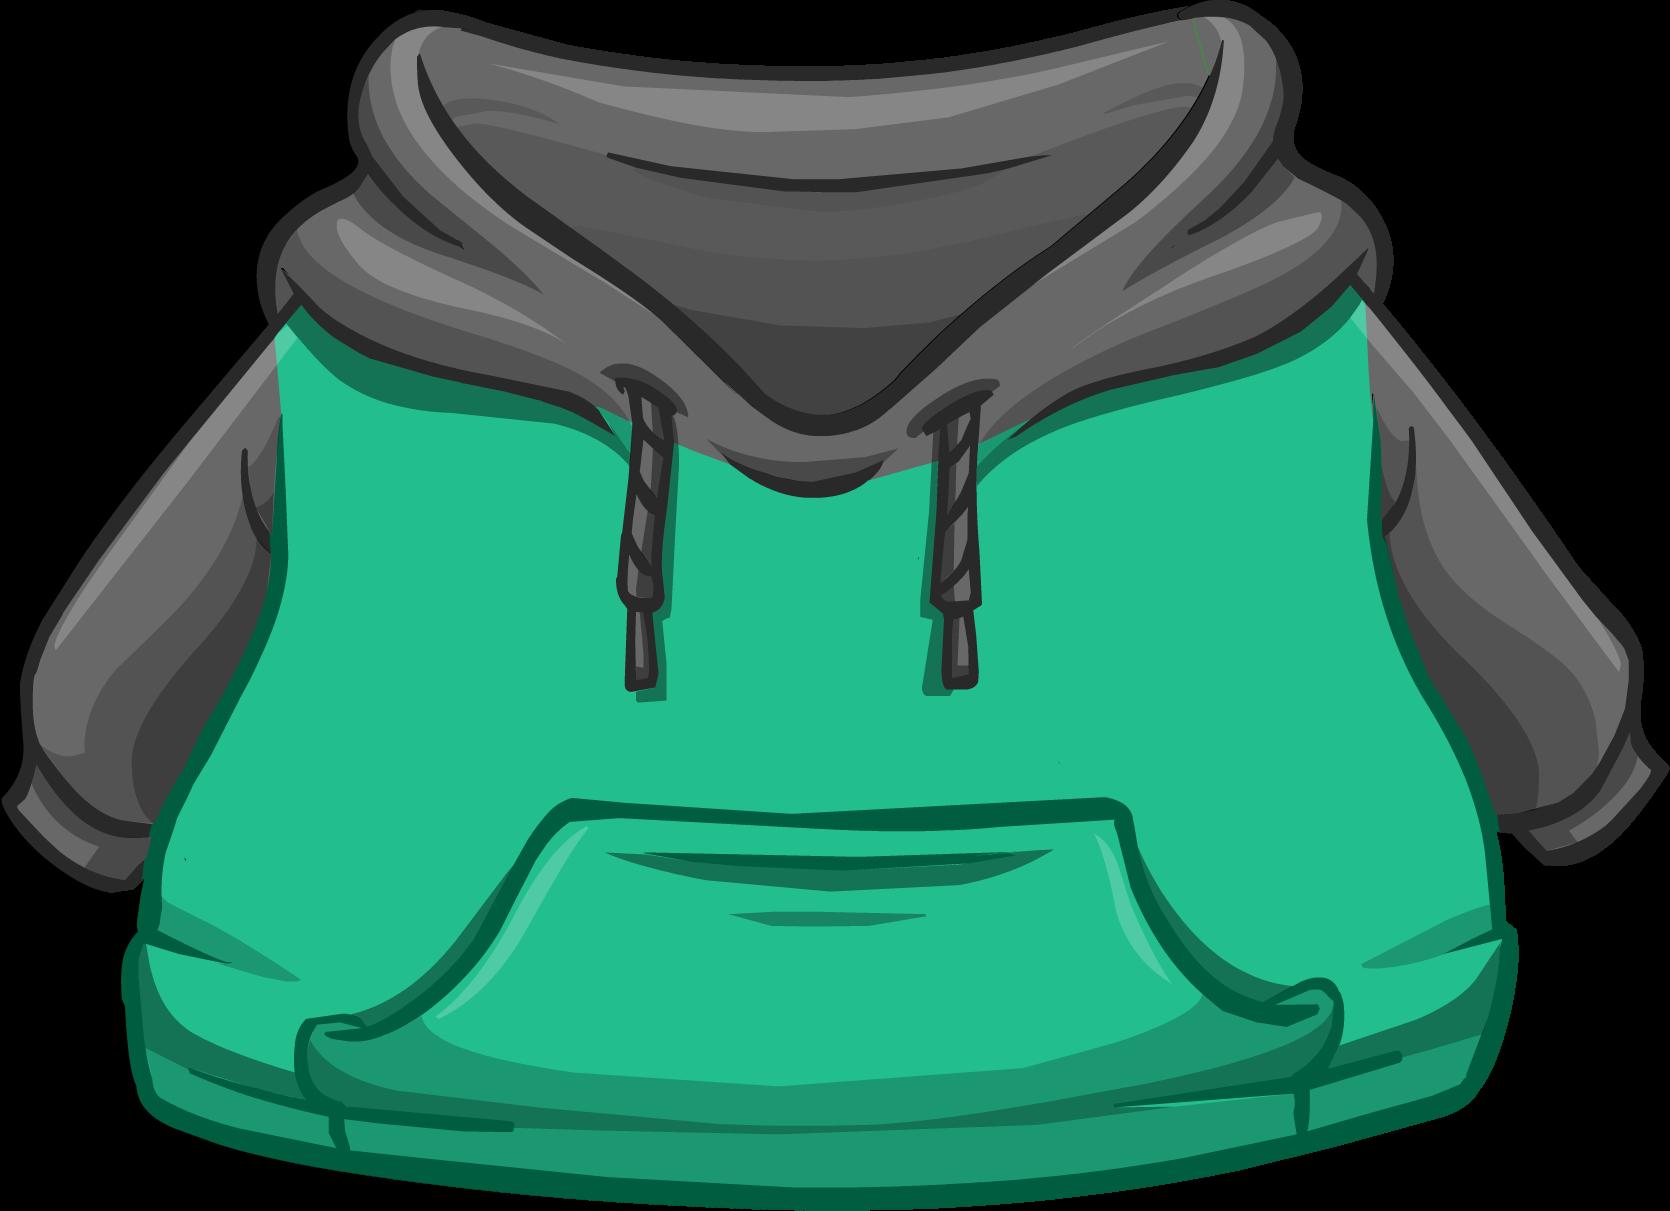 Cangurito Dos Tonos Verde y Negro